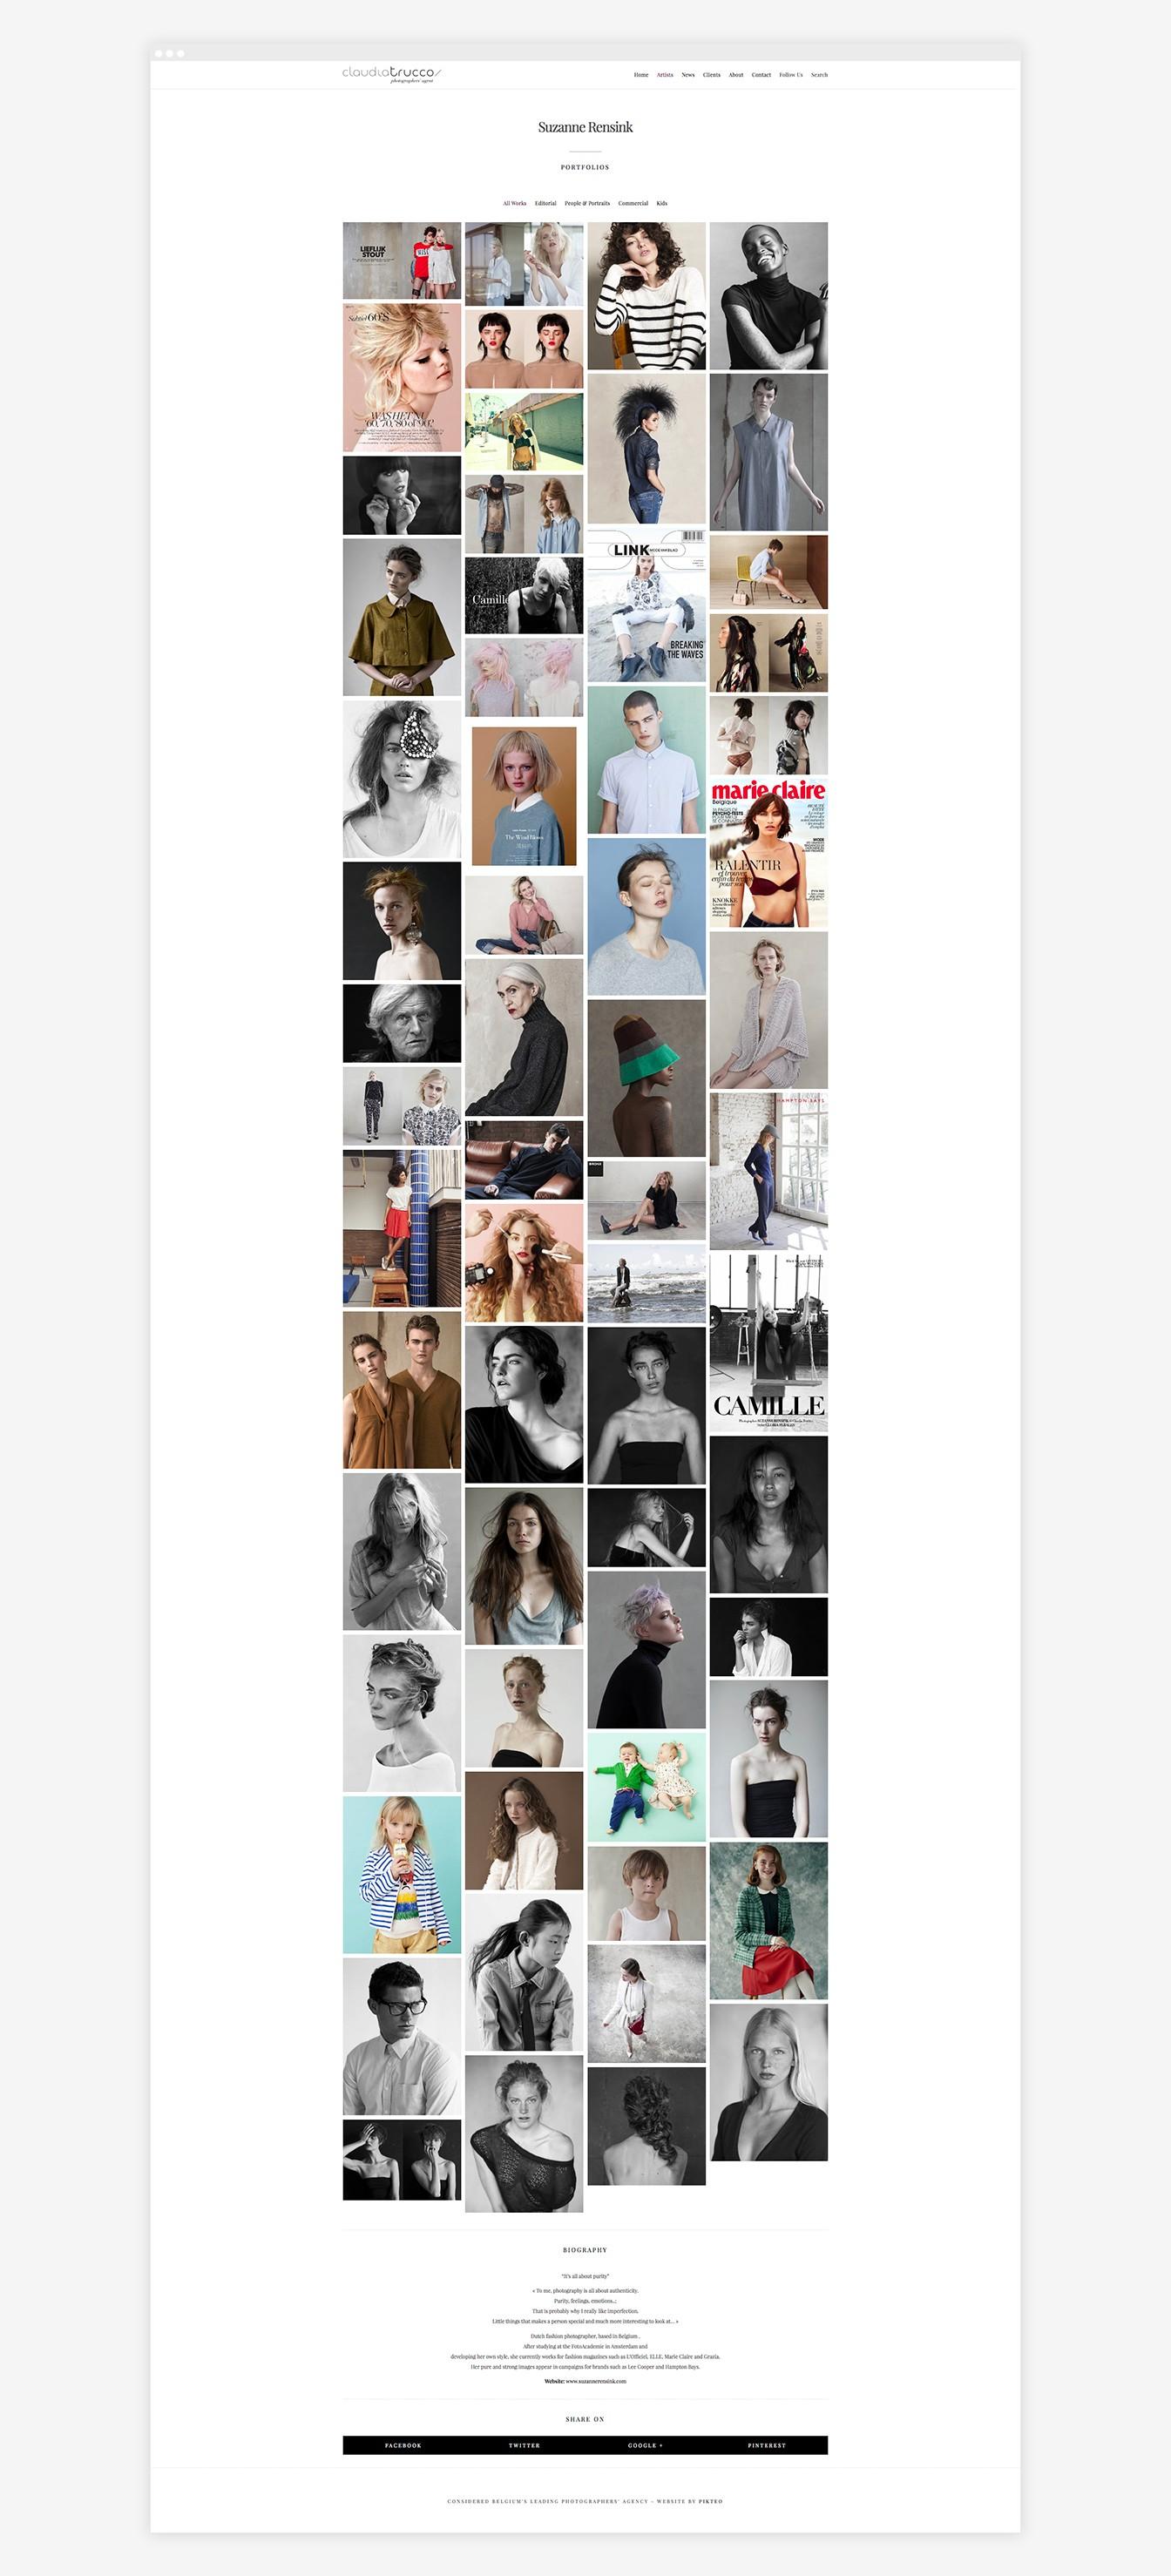 02-claudia-trucco-web-pikteo-webdesign-graphic-design-freelance-paris-bruxelles-lyon